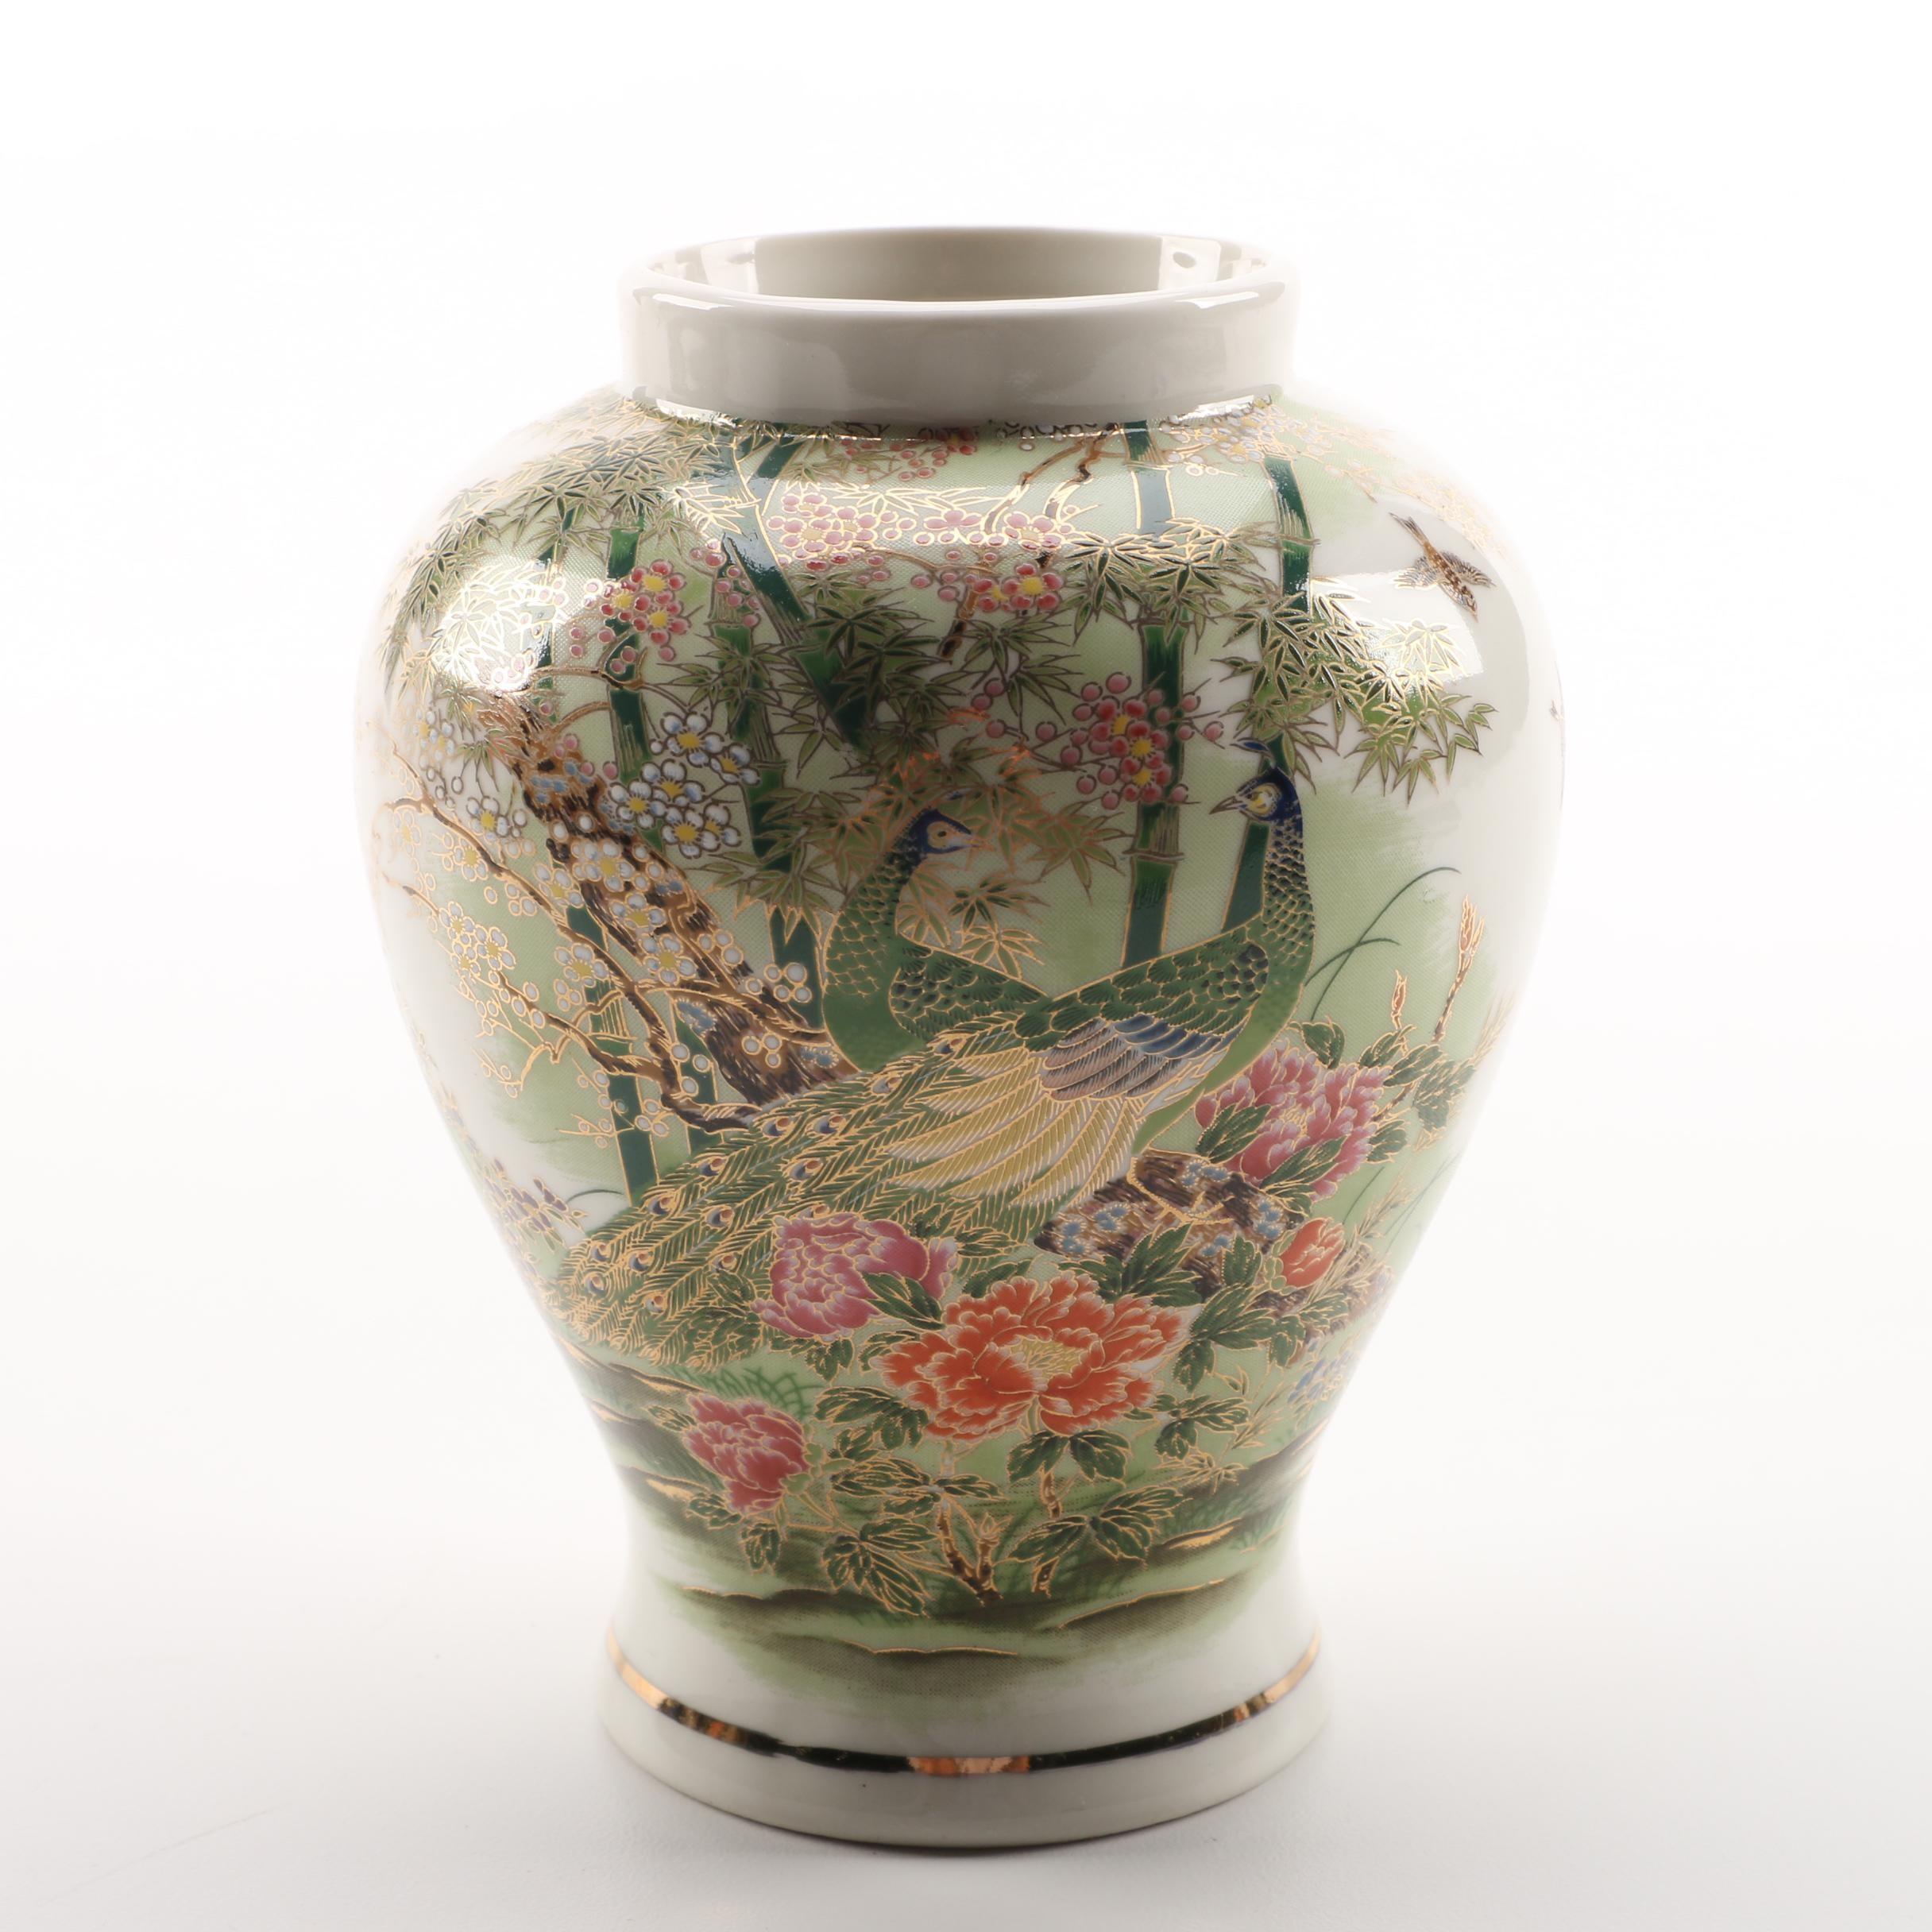 Japanese Peacock Ceramic Vase